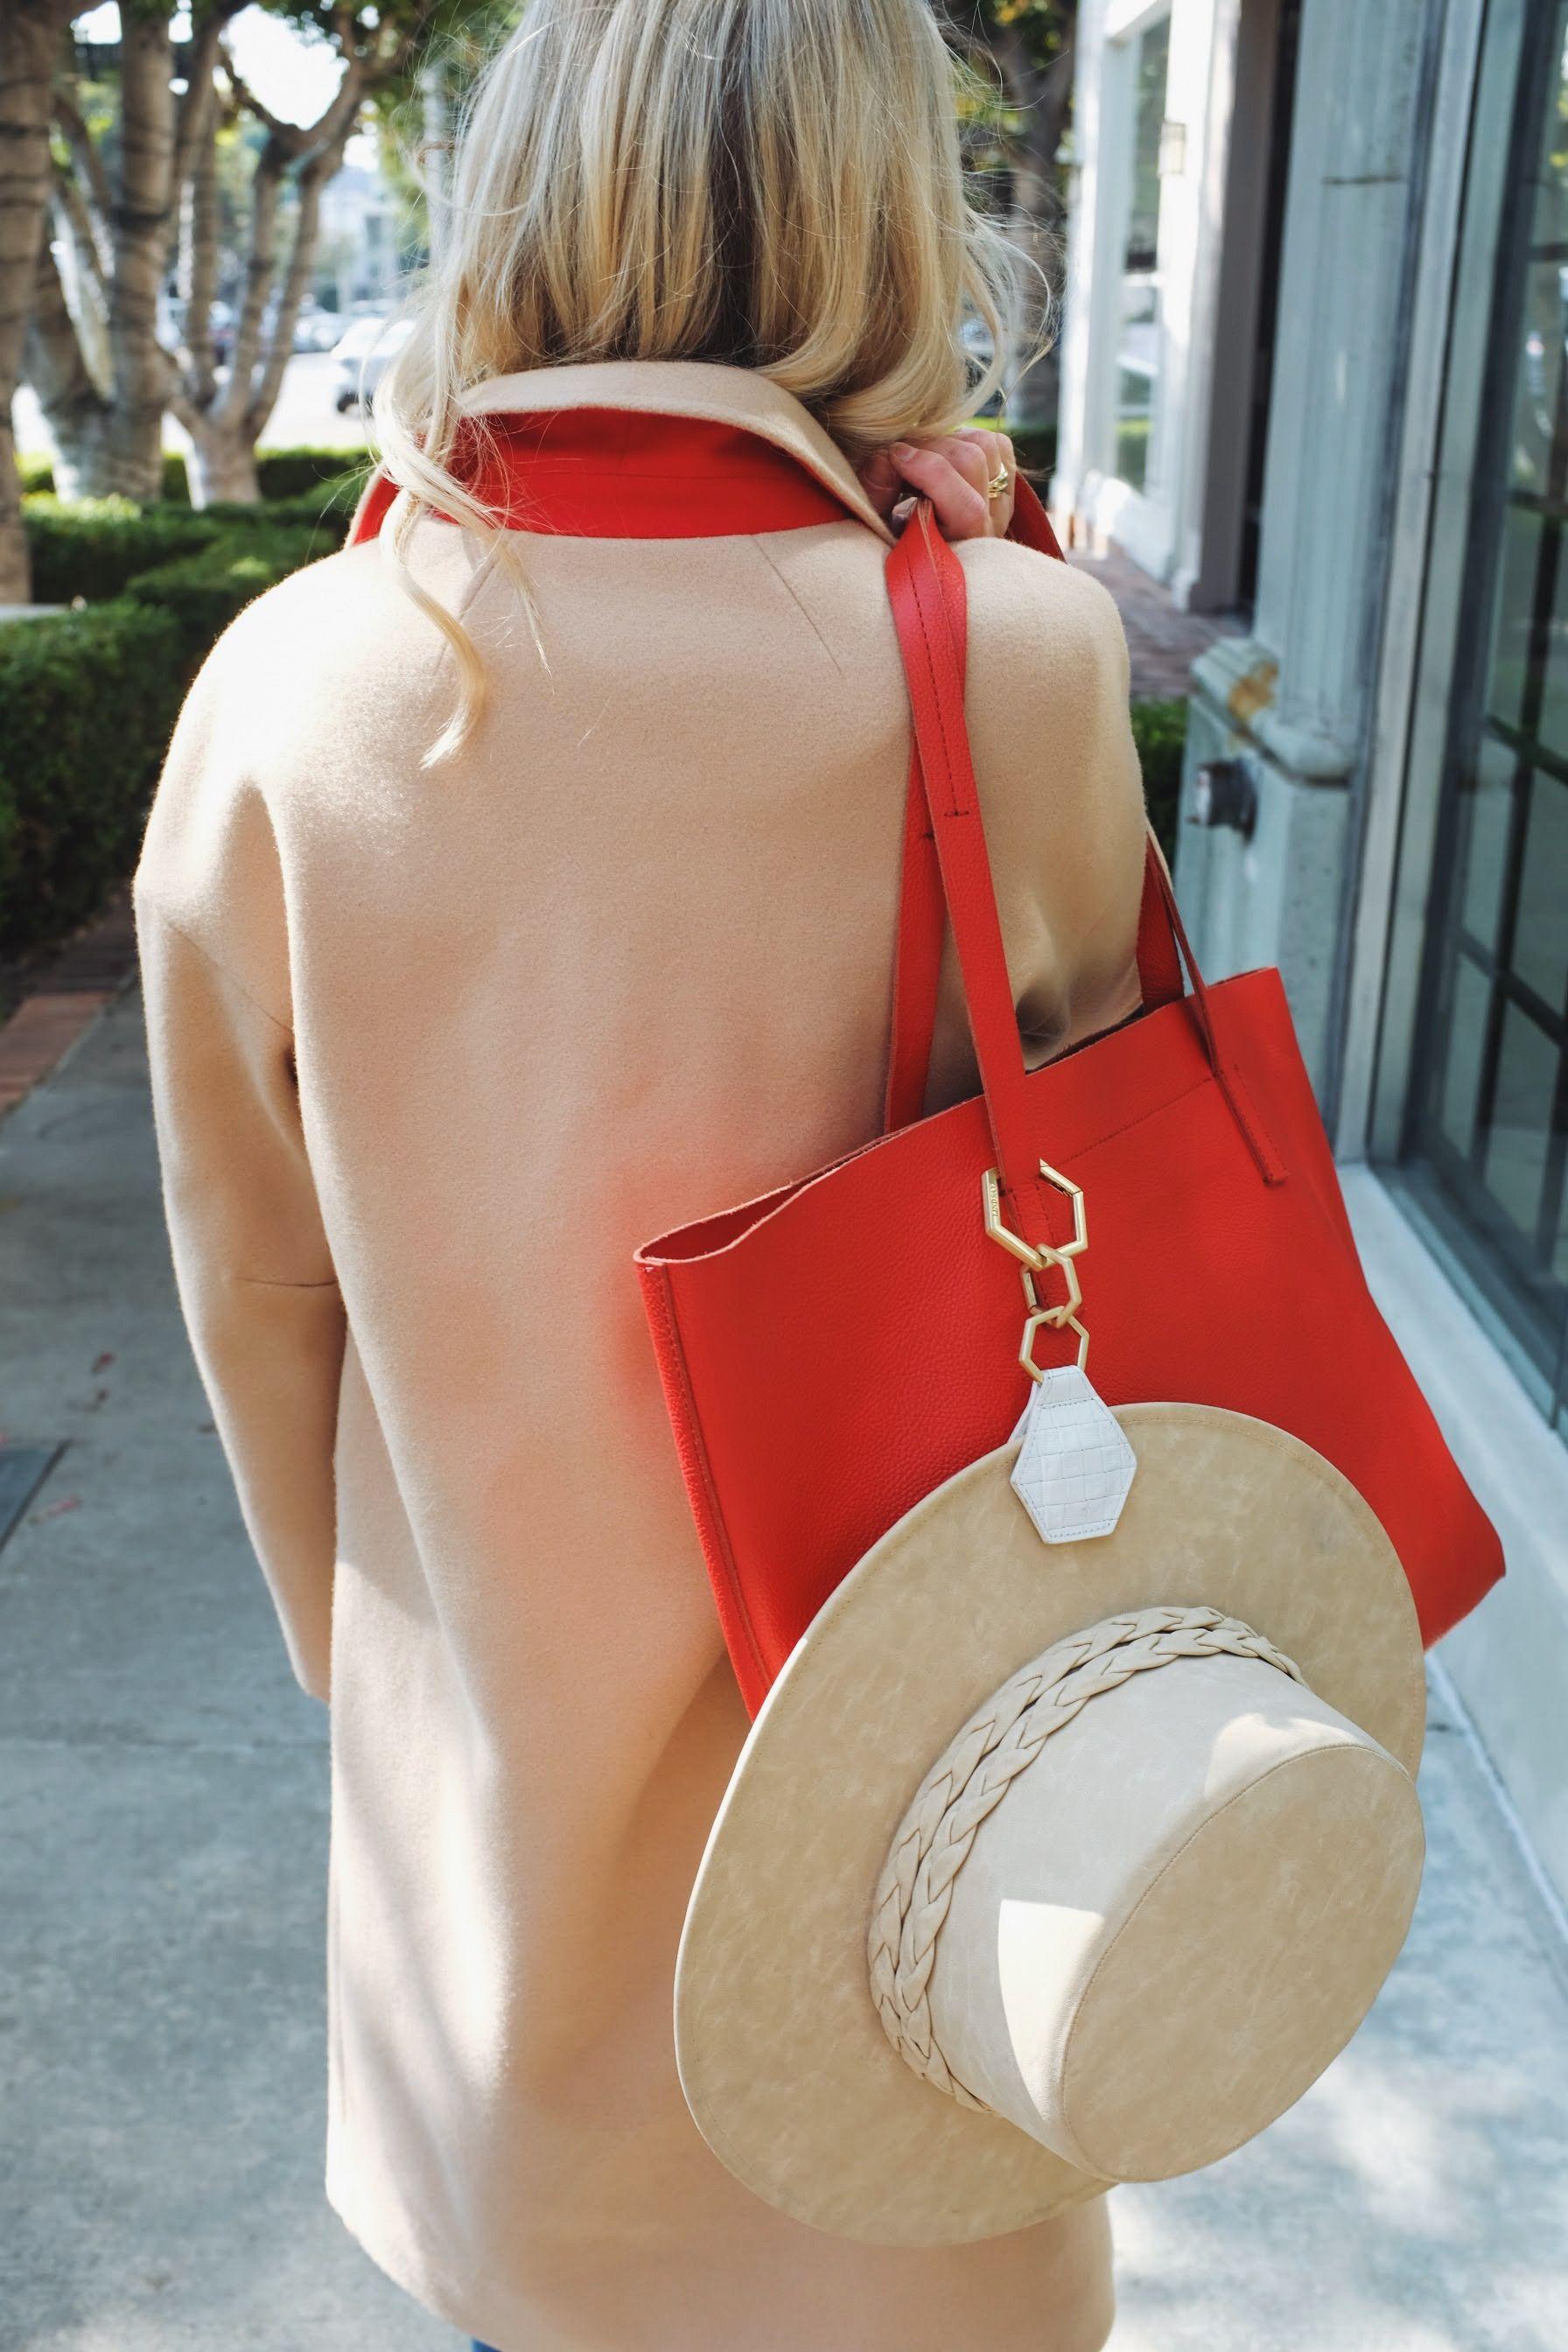 Hex Chic Handbags Leather Protectant Handbag Charms